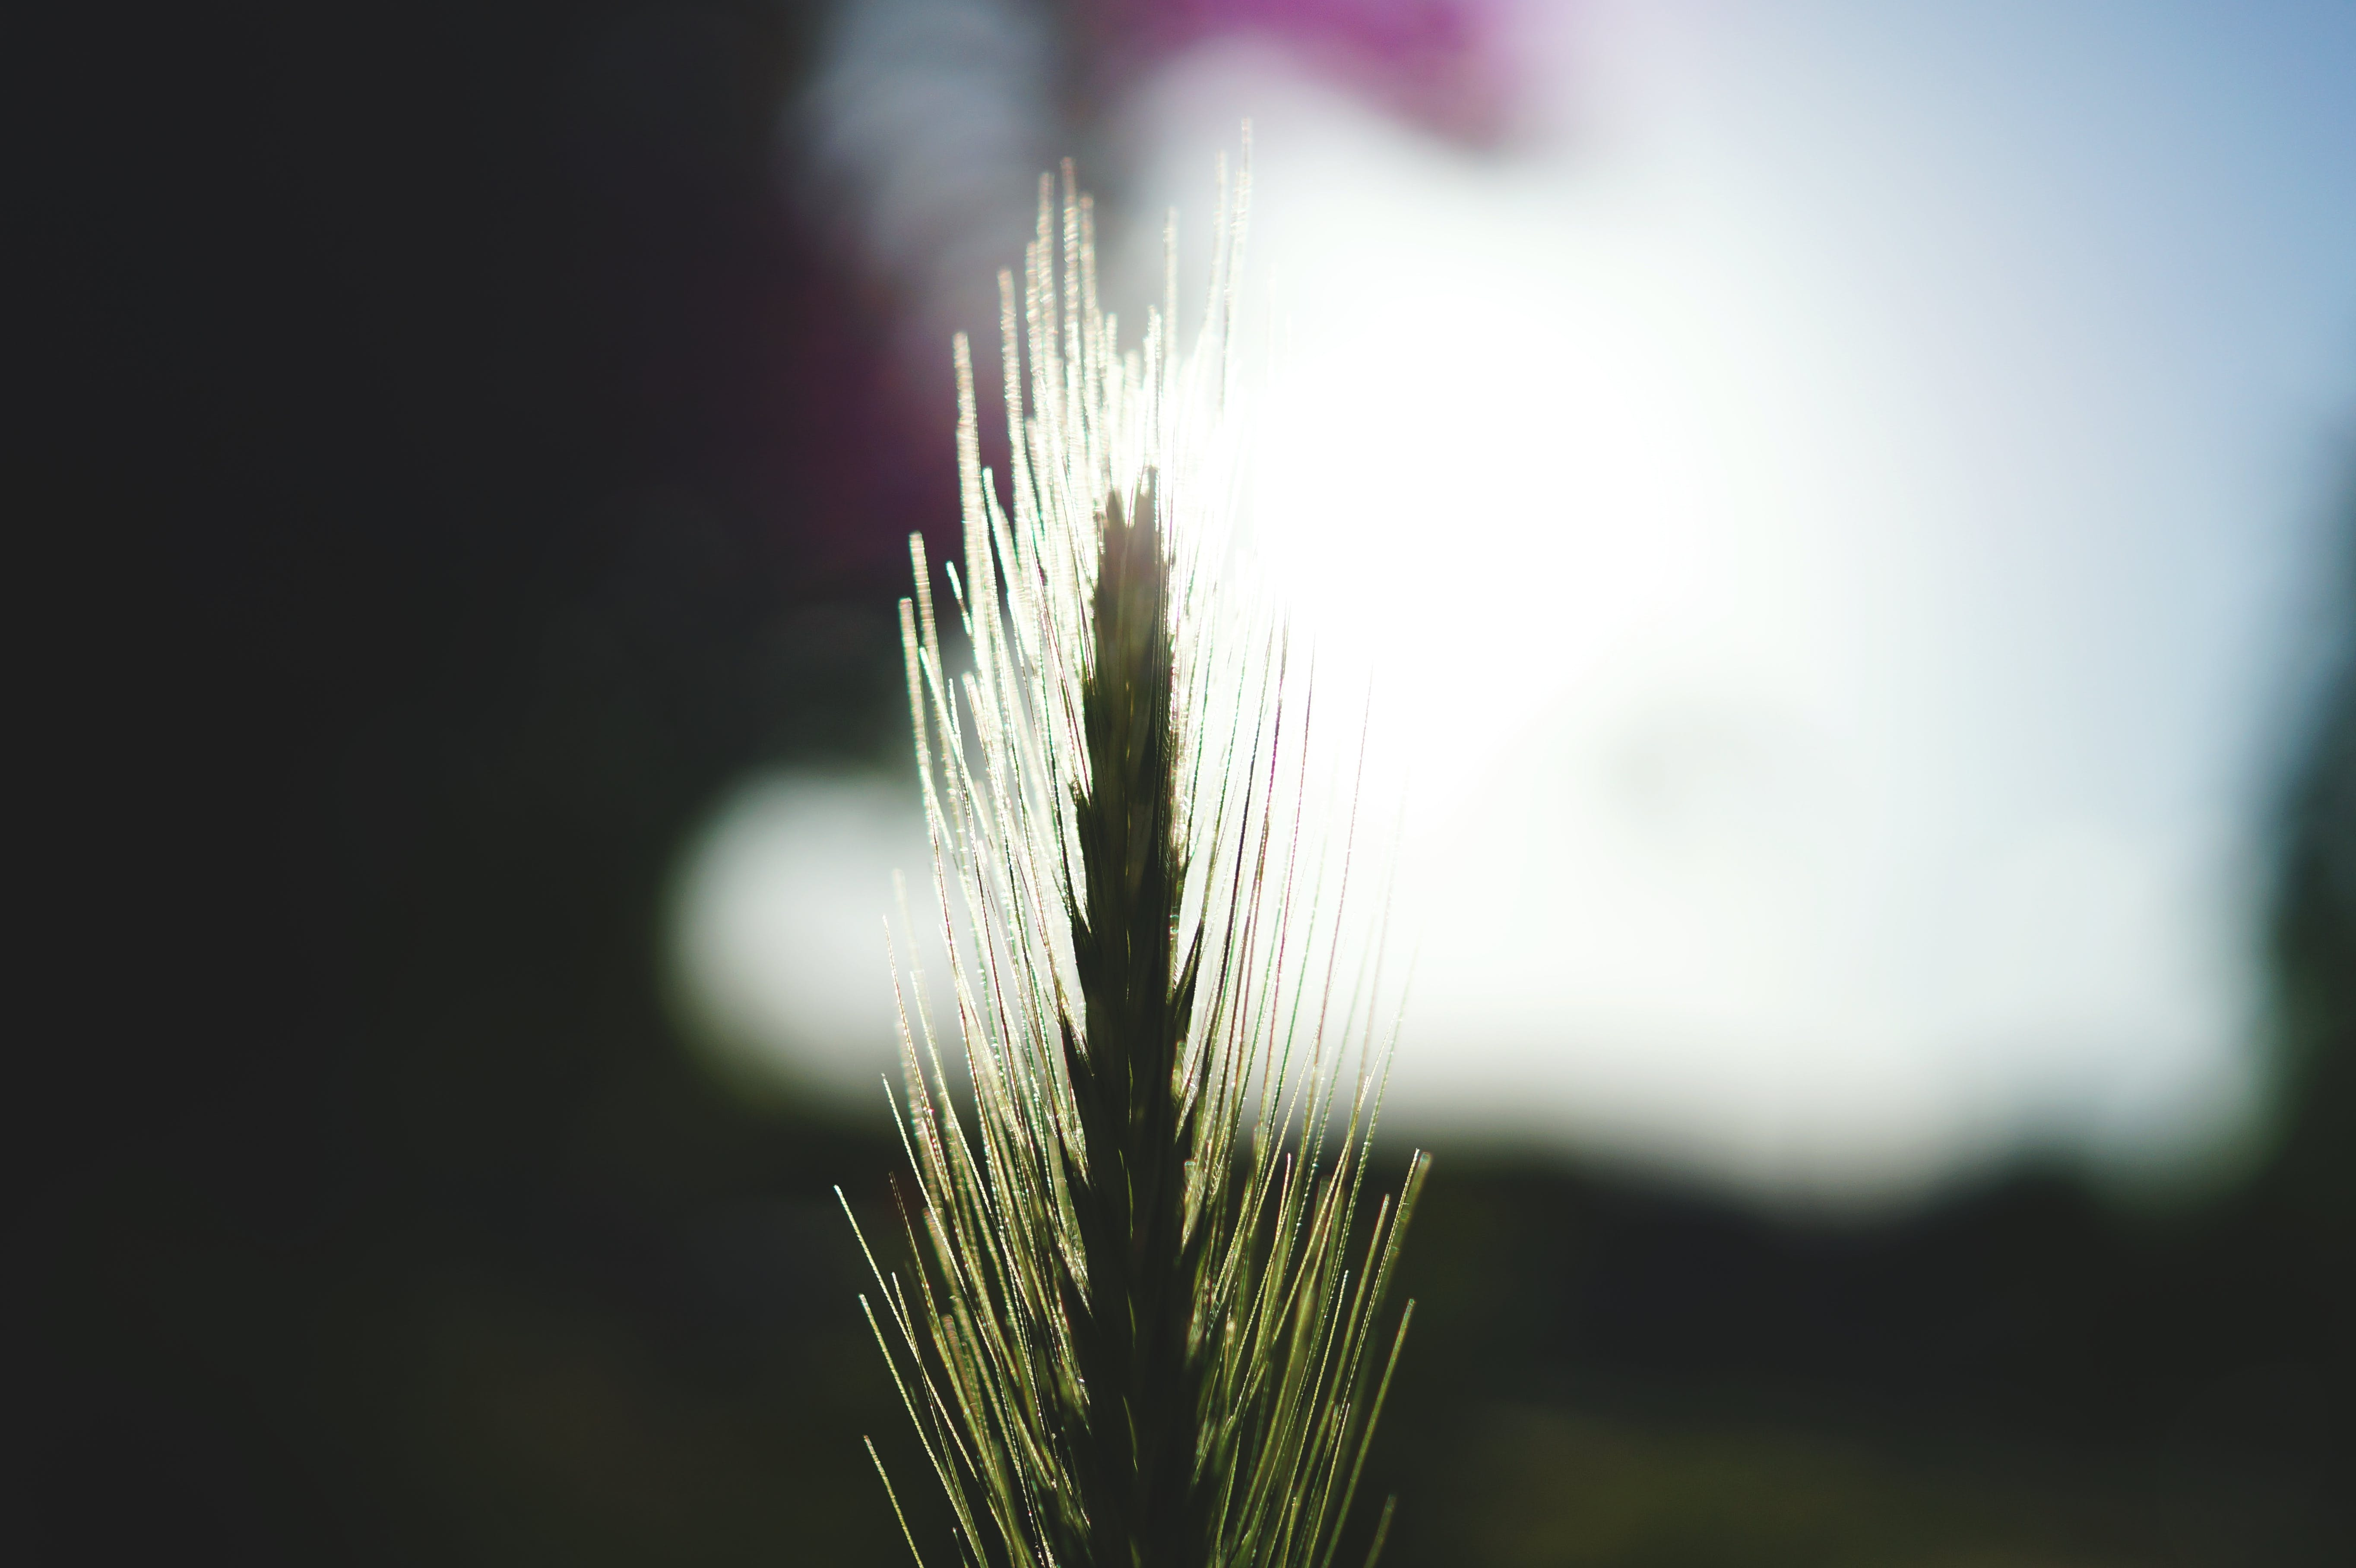 Focus Photography of Green Grass